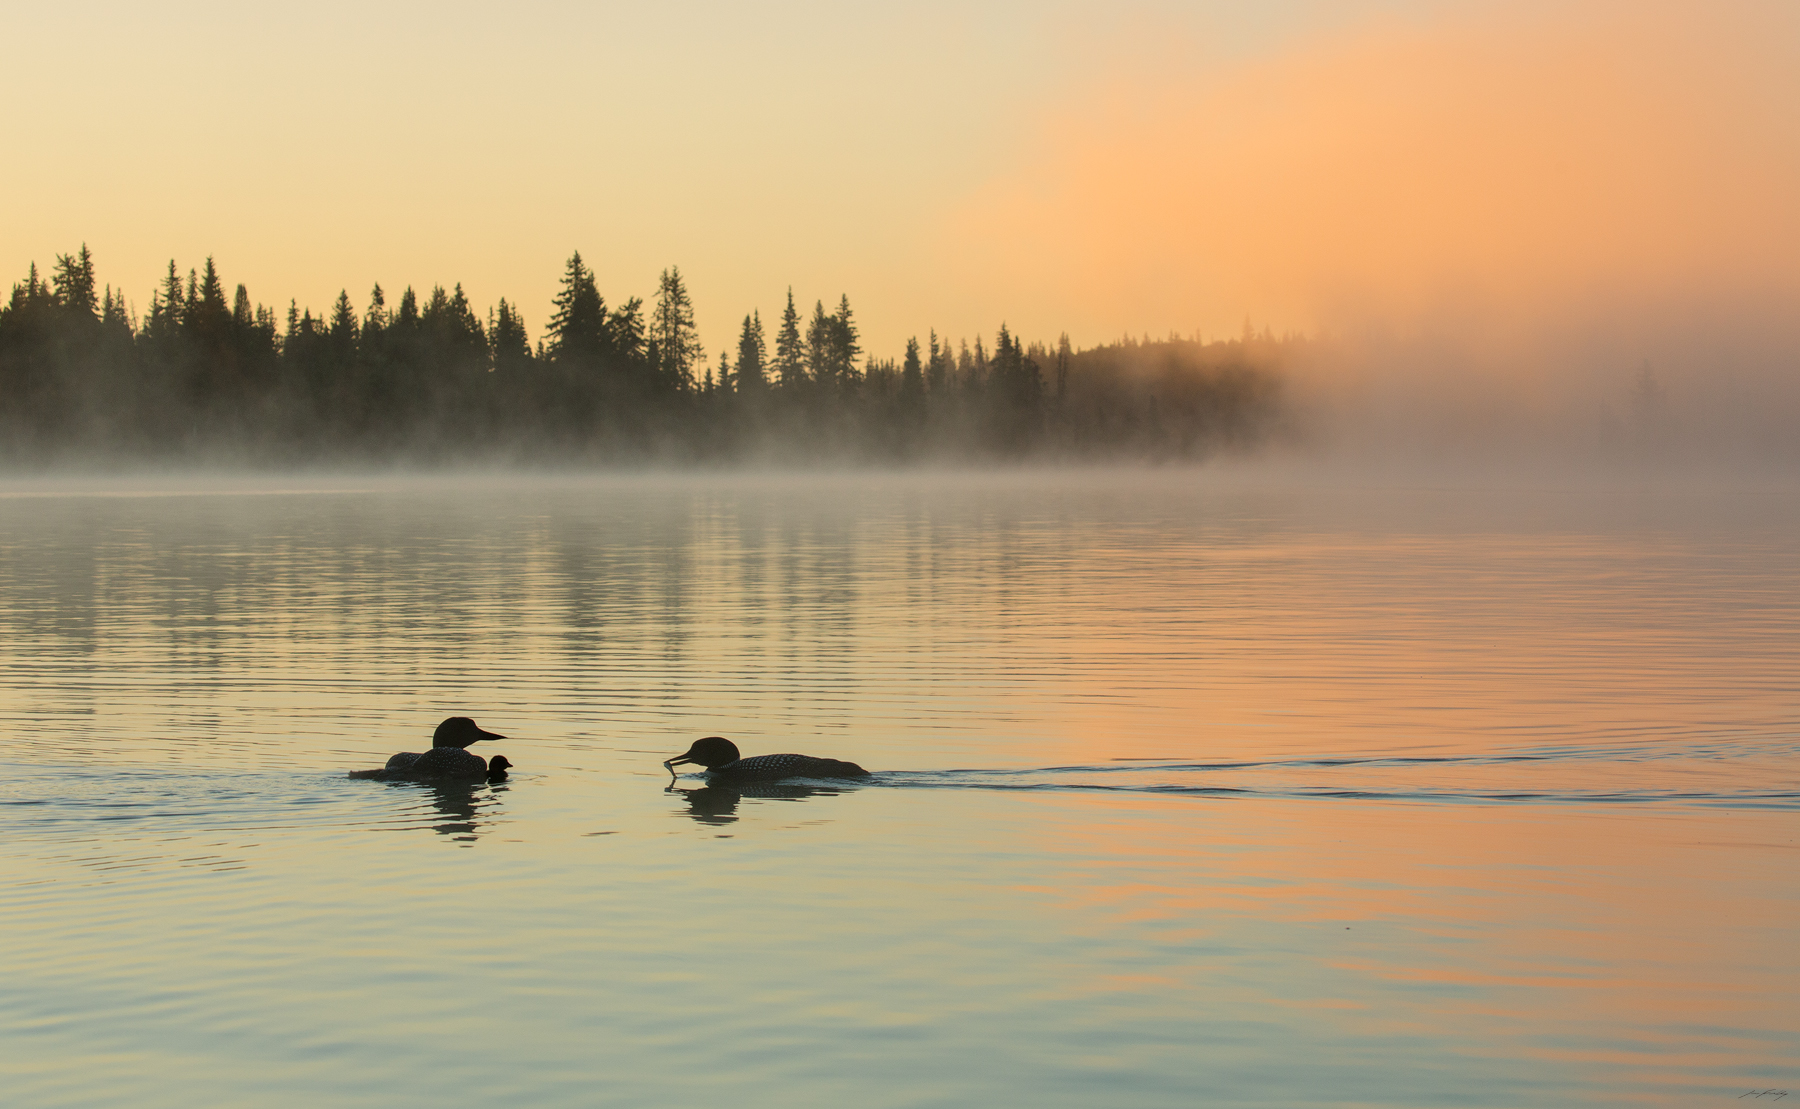 Common Loon Family, British Columbia, Canada